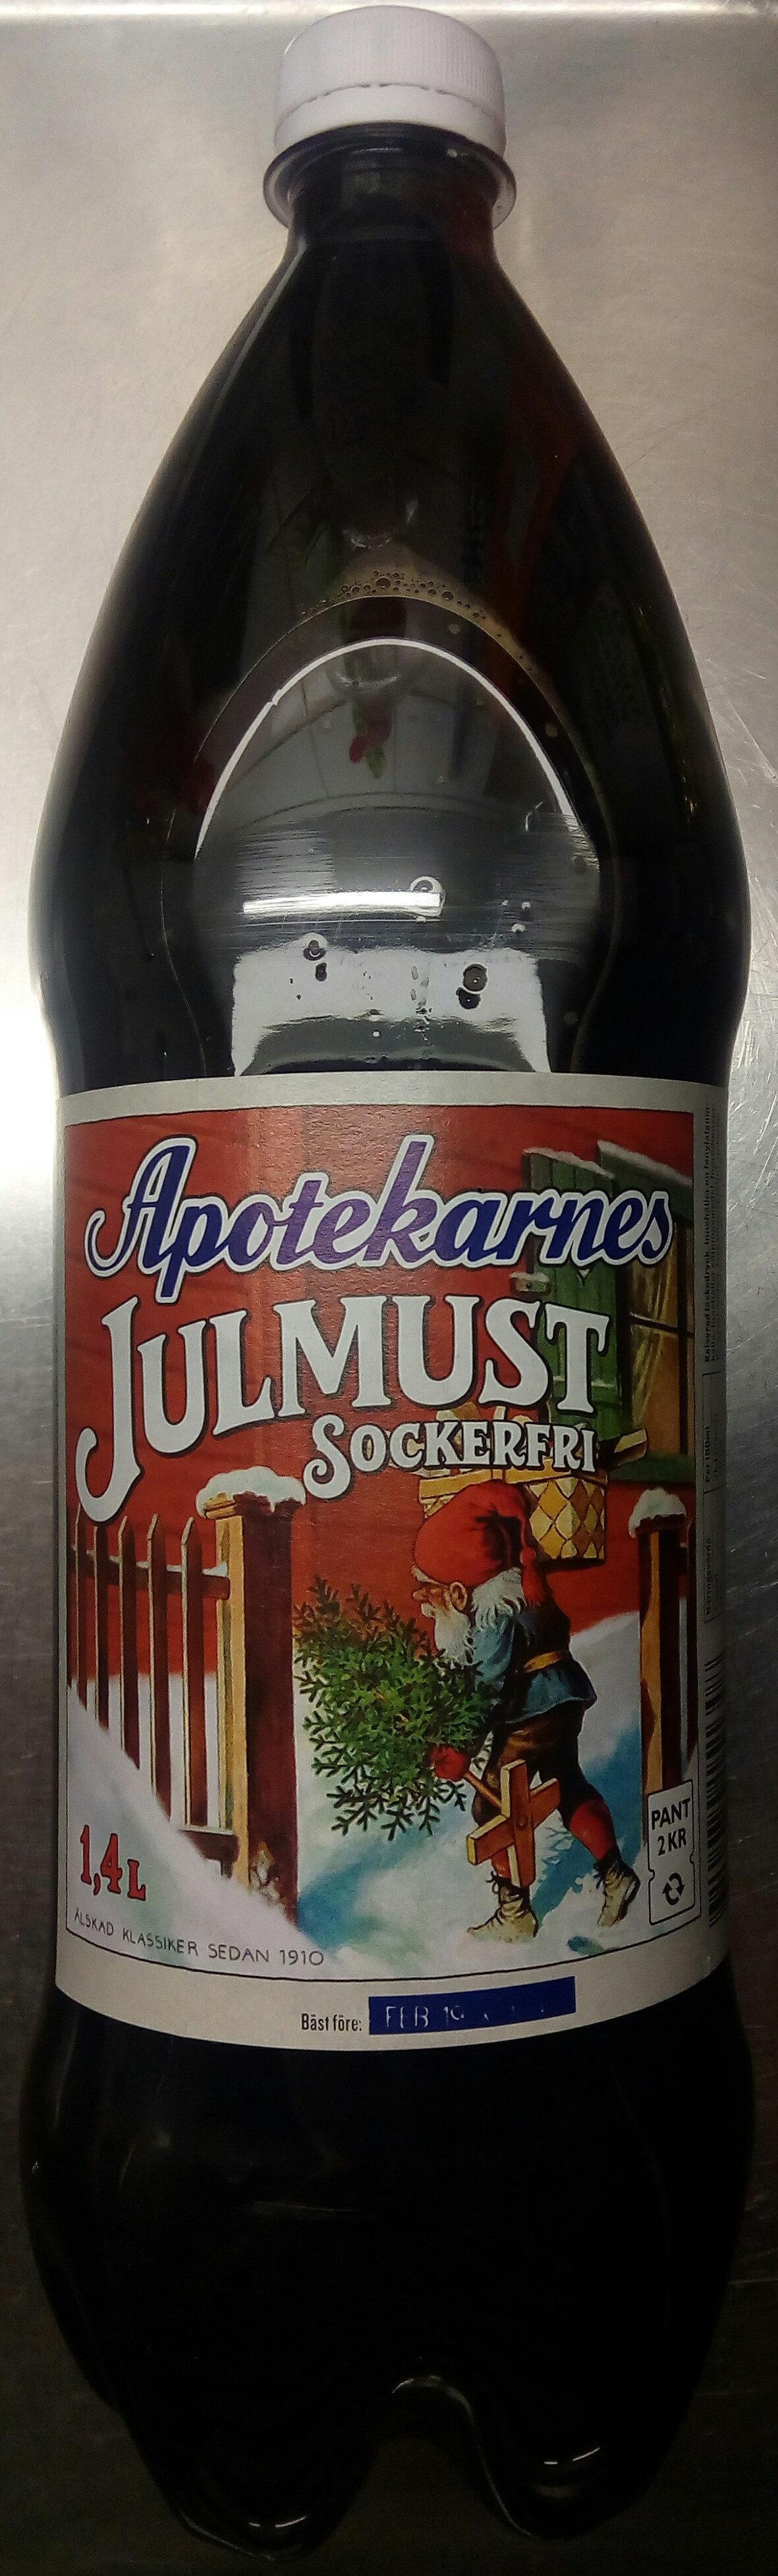 Apotekarnes Julmust Sockerfri - Produit - sv